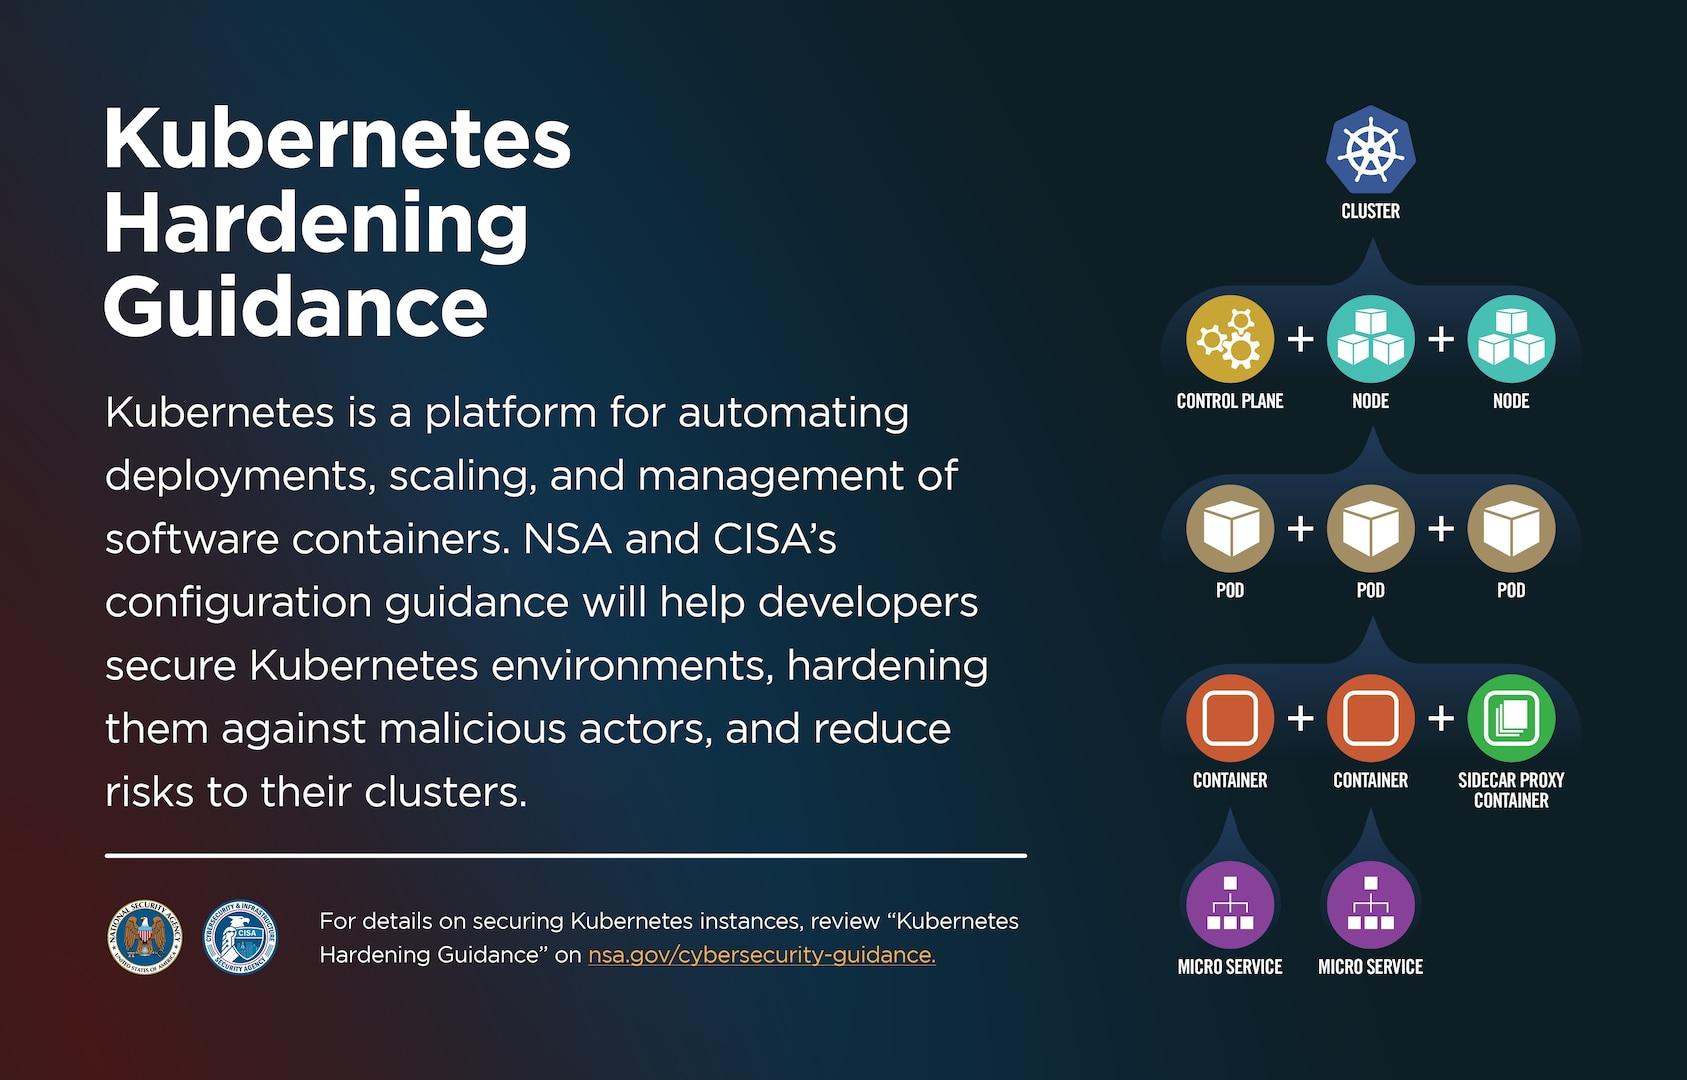 NSA, CISA release Kubernetes Hardening Guidance